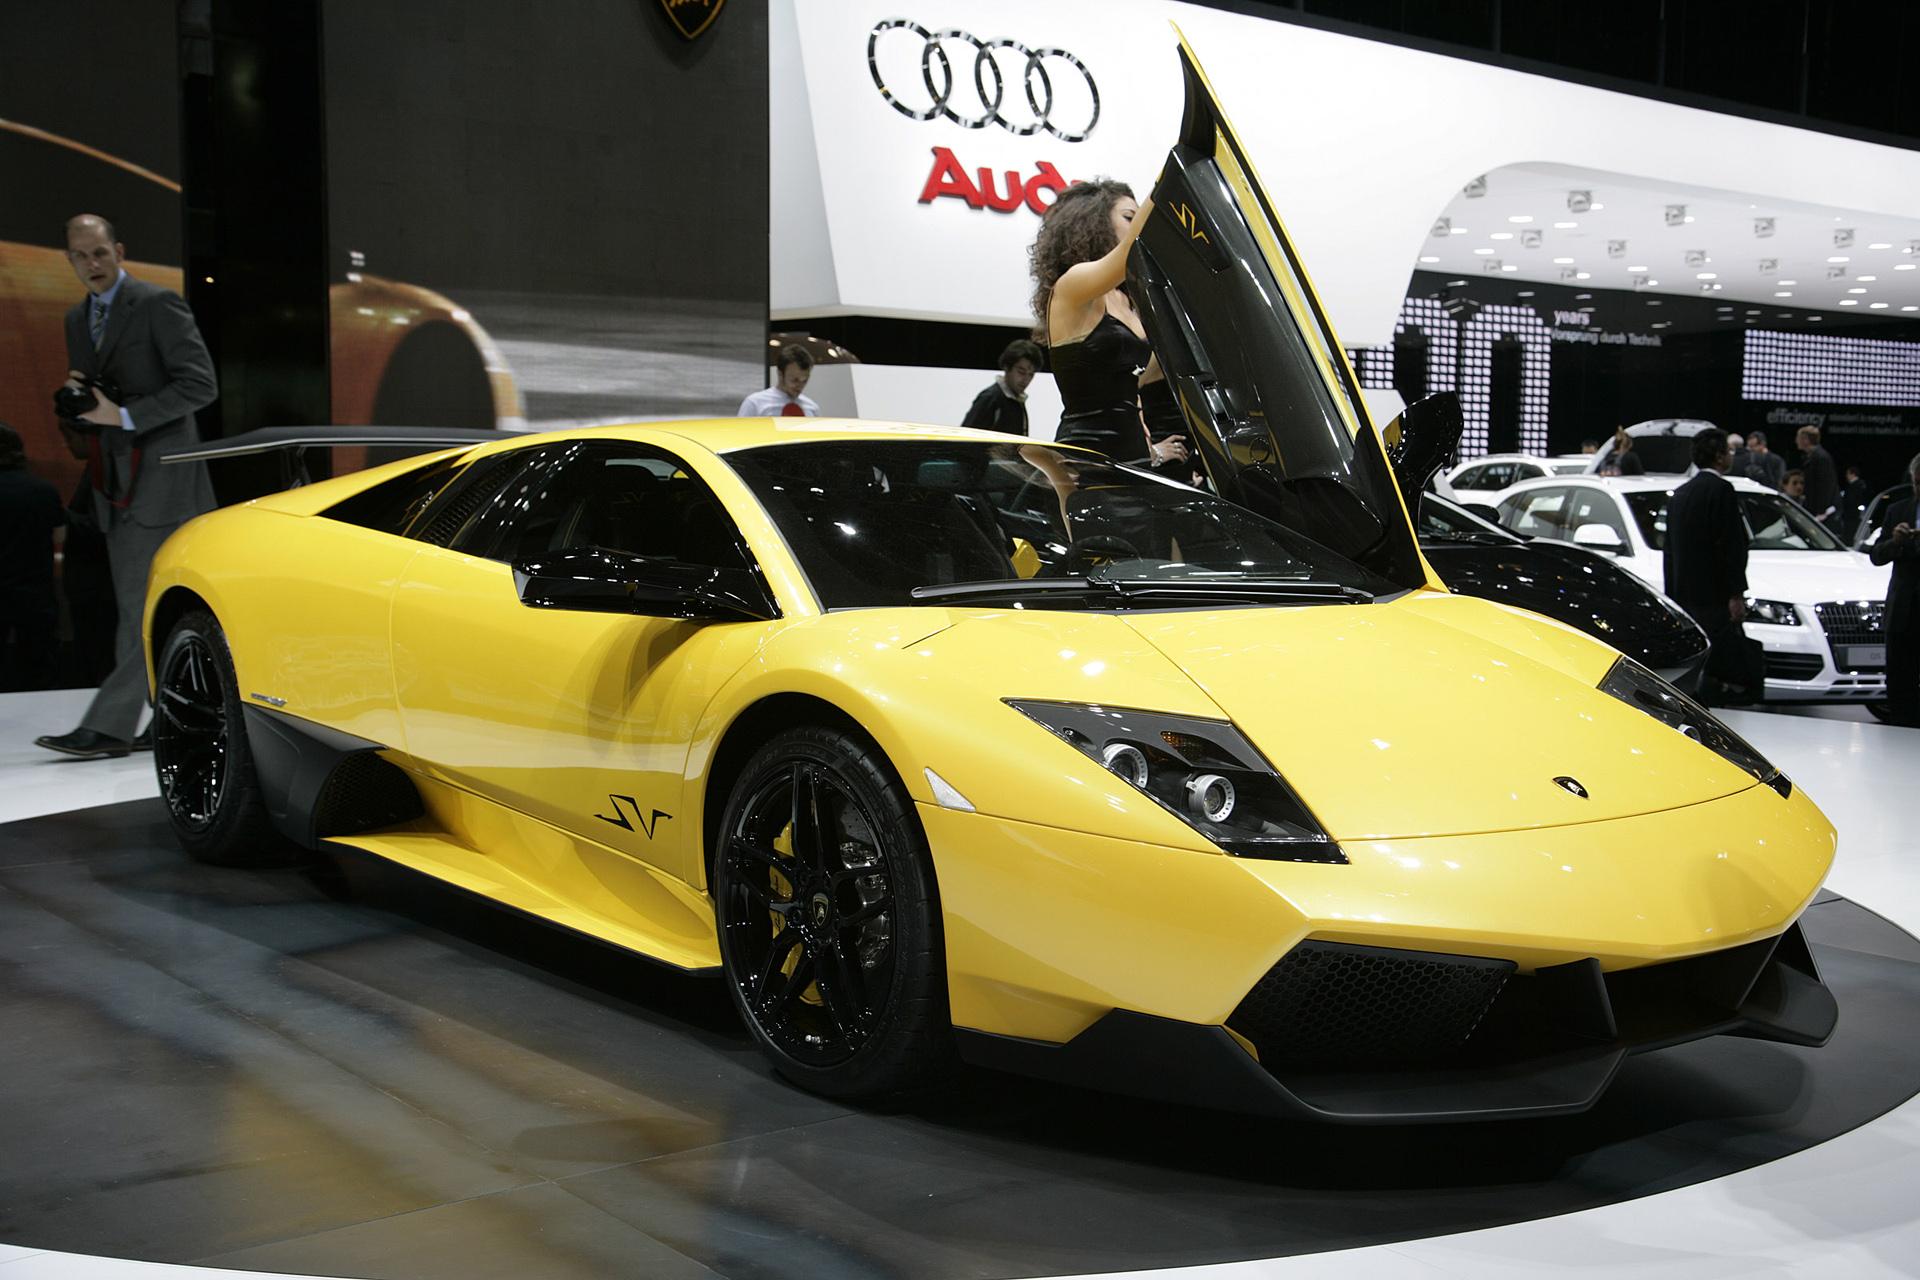 Lamborghini Murcielago LP670-4 SuperVeloce photo #63664